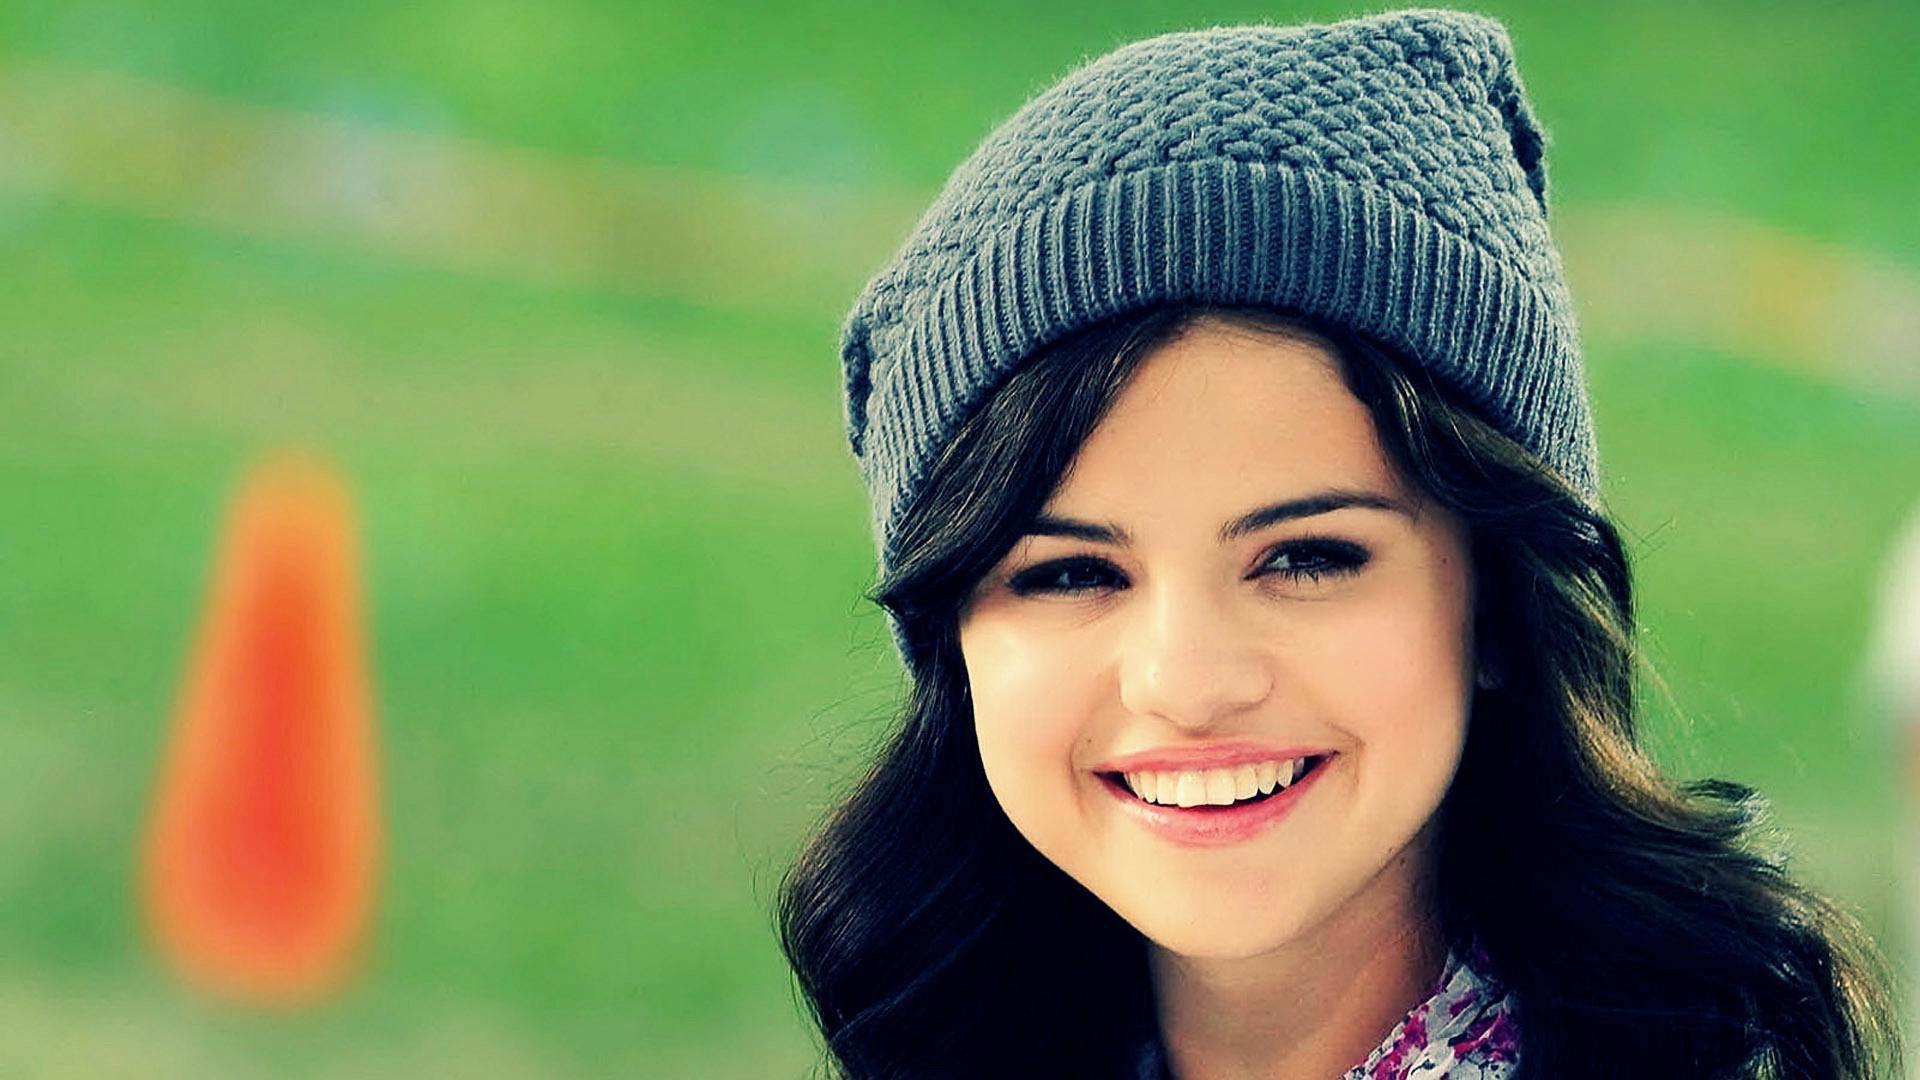 Selena Gomez Smile Wallpaper 39785 in Celebrities F - Telusers.com